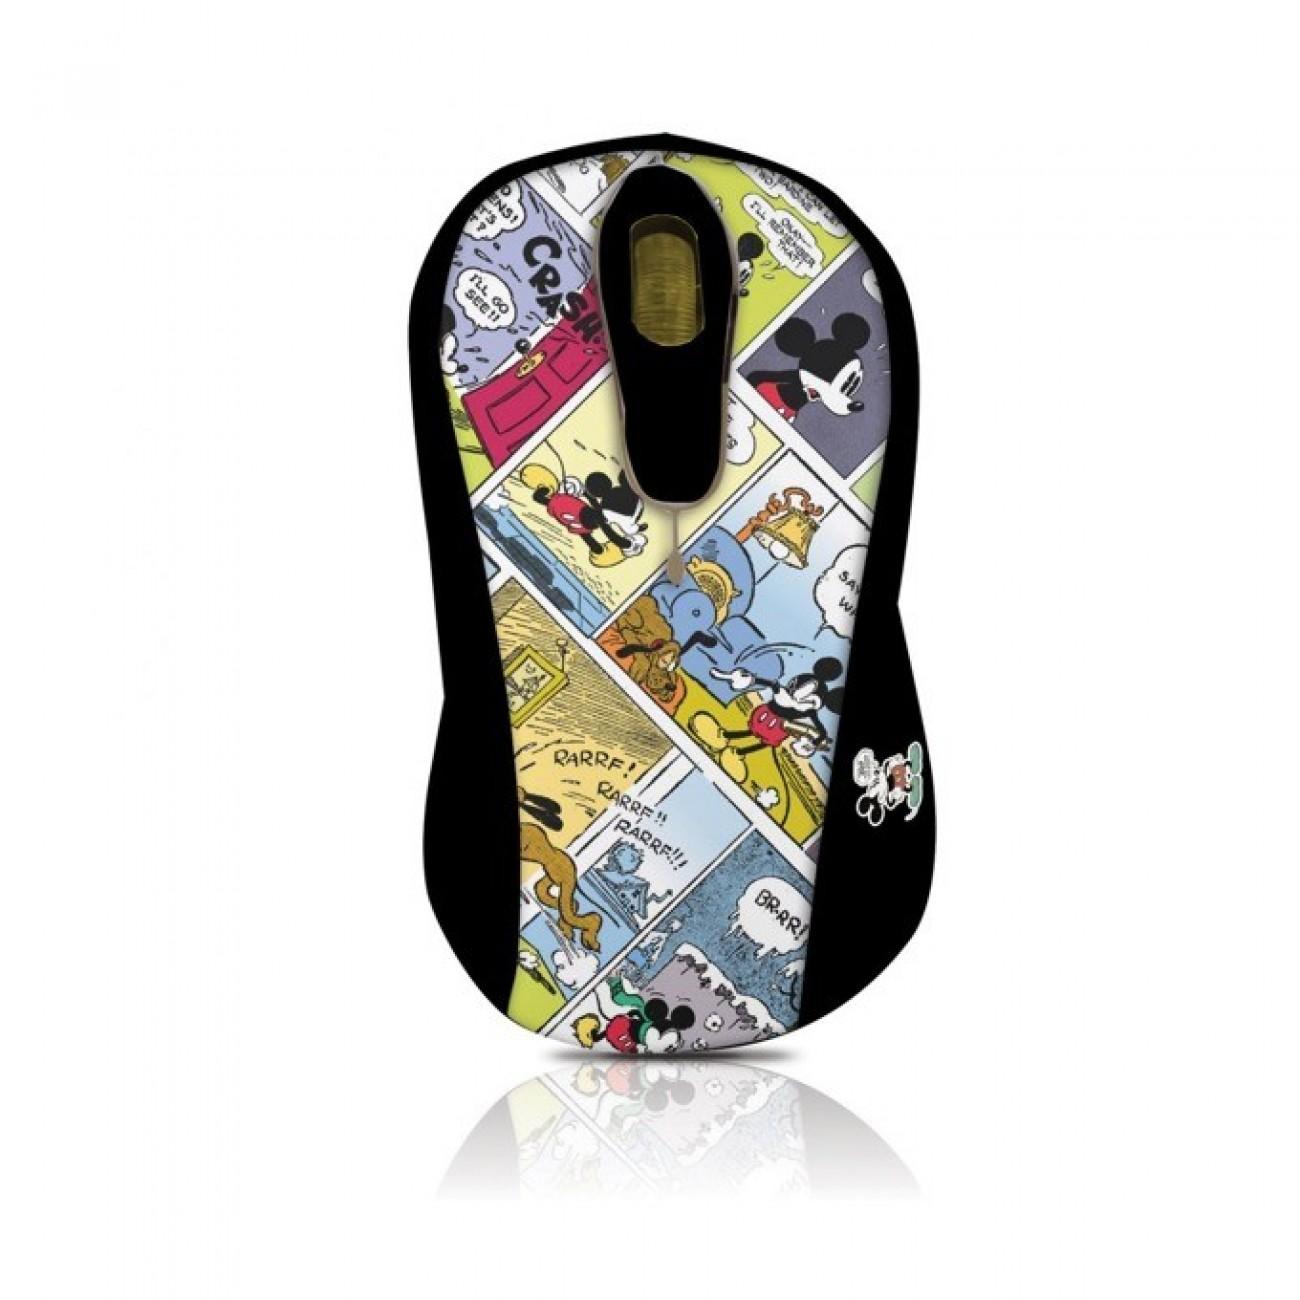 Мишка Circuit Planet Mickey DSY-MO151, оптична (800 dpi), USB, щампа в Мишки -  | Alleop